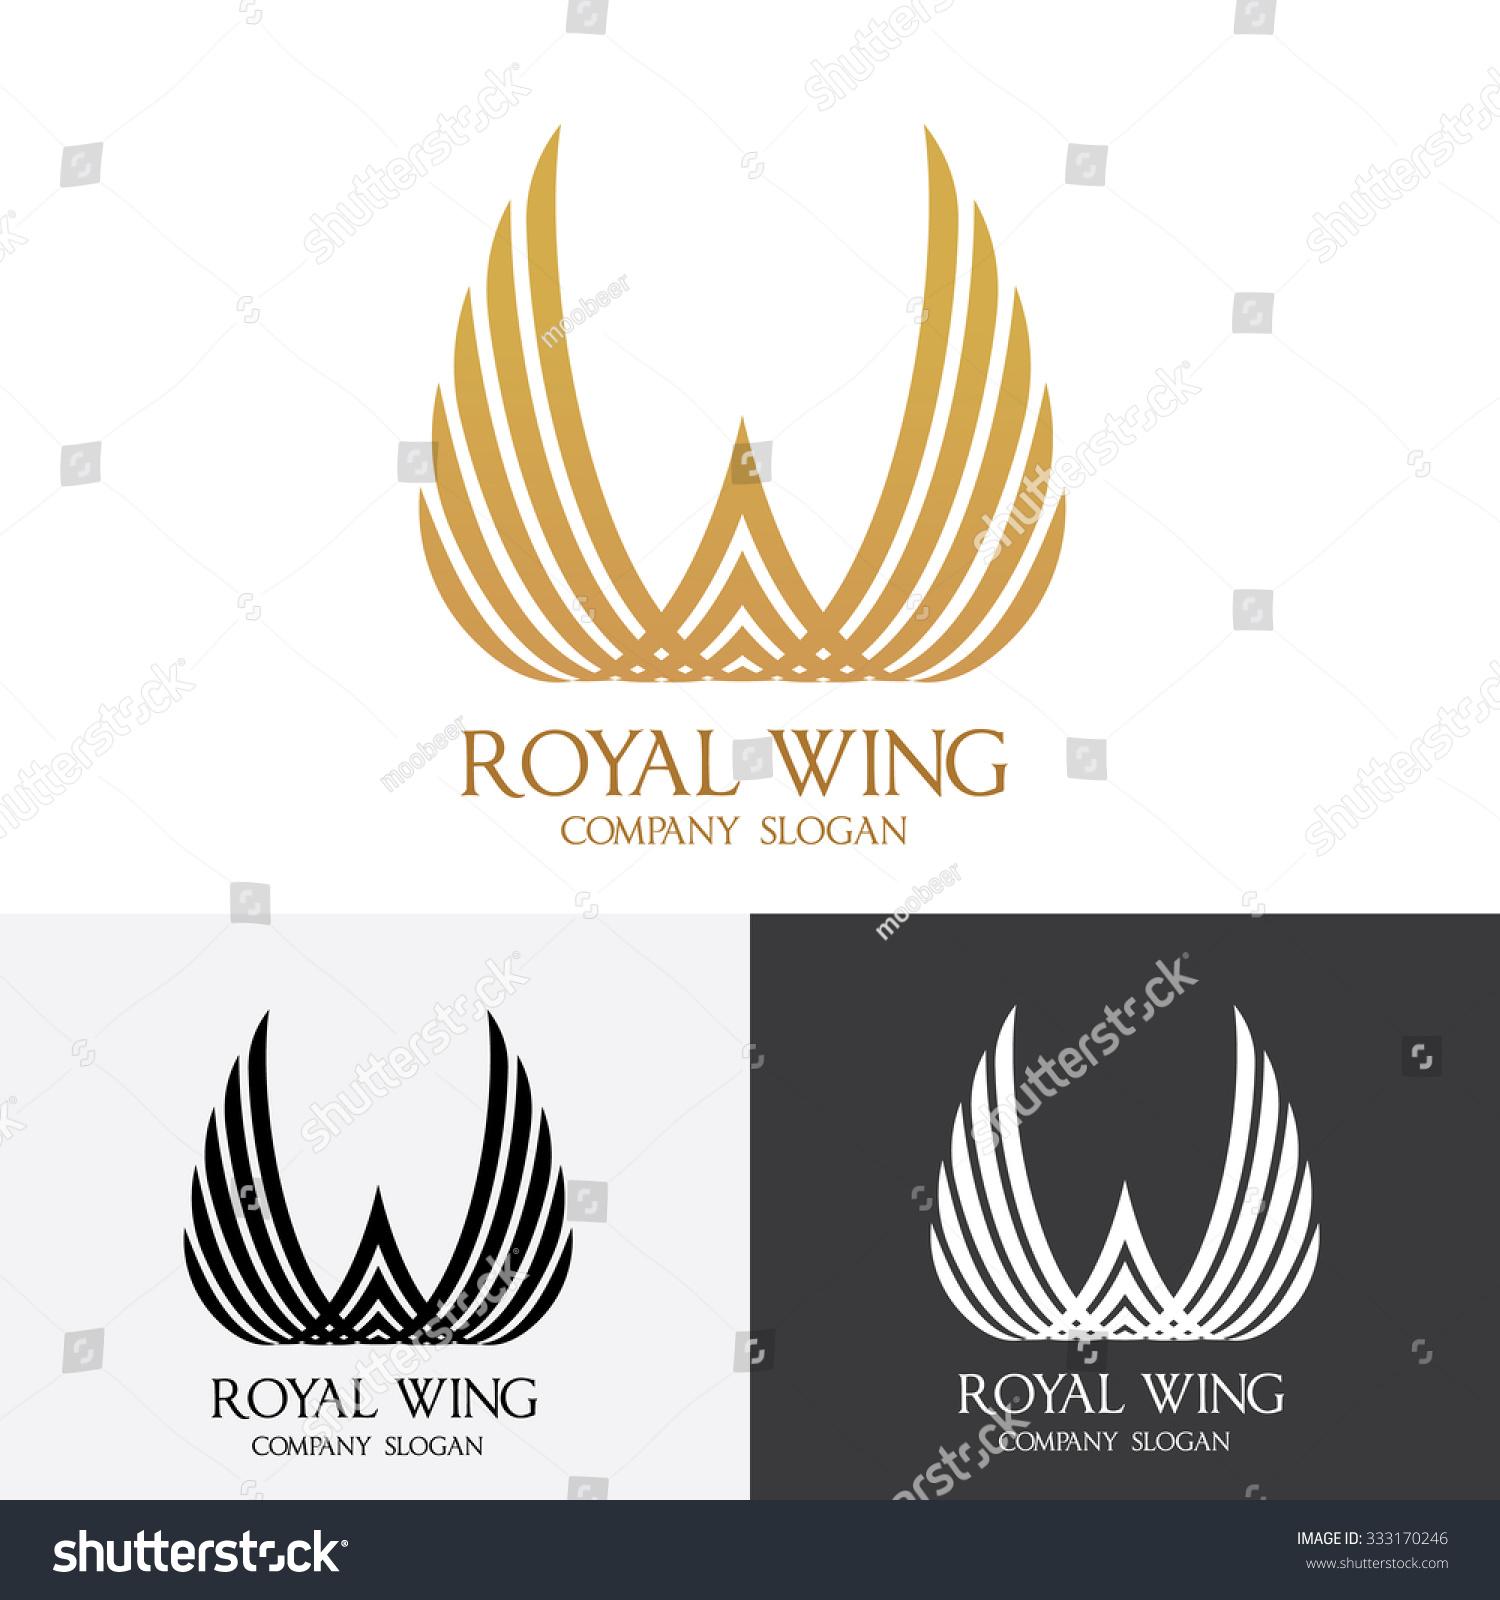 royal wing wing logo royal logo vector logo template 333170246 shutterstock. Black Bedroom Furniture Sets. Home Design Ideas